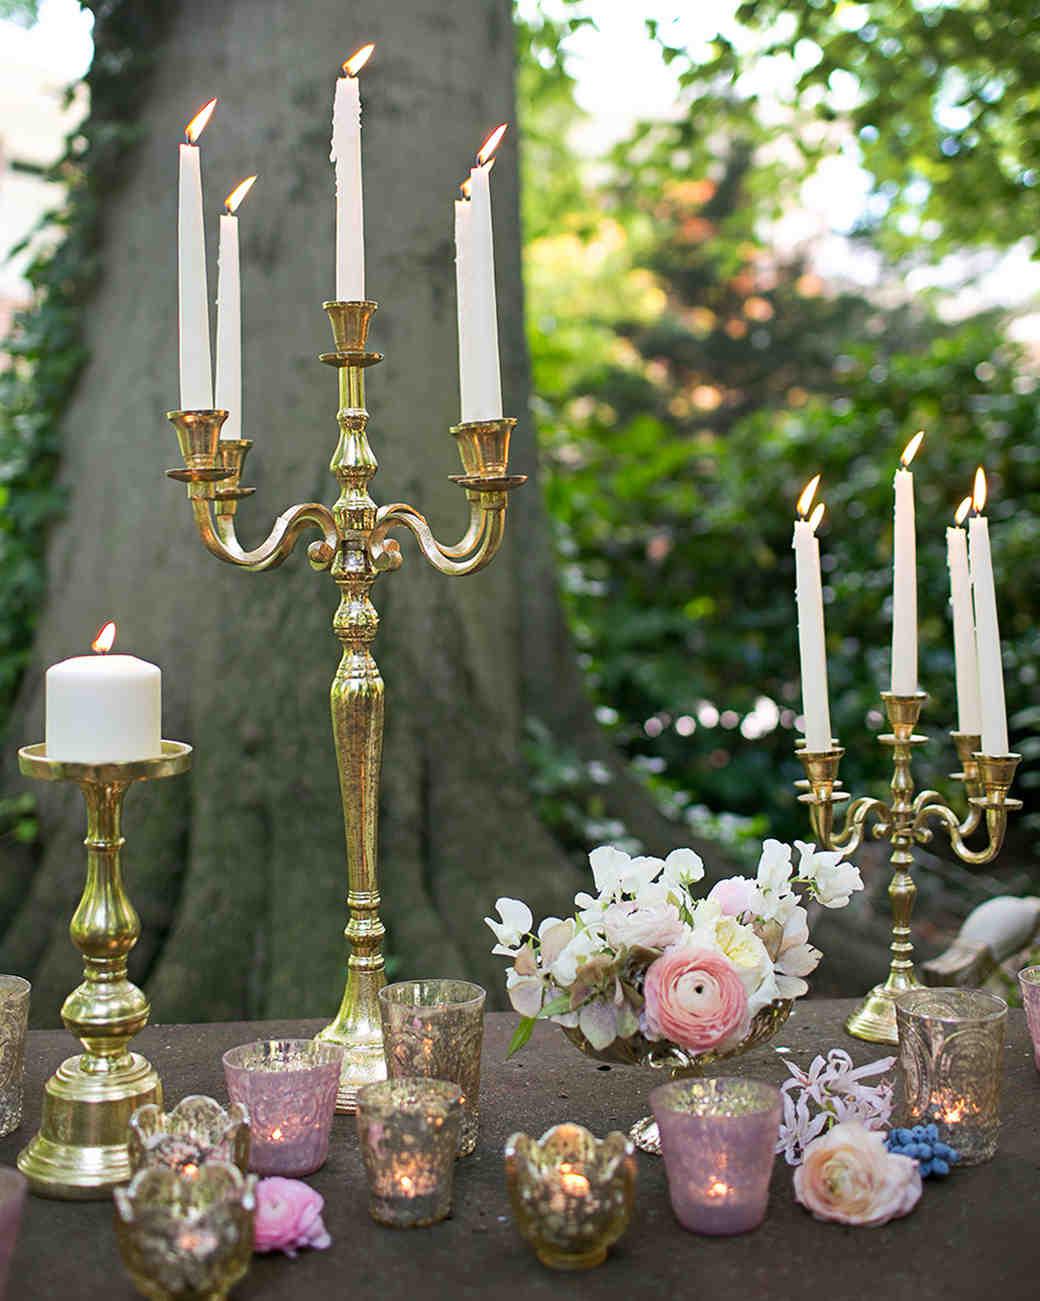 sting-trudie-styler-inspired-wedding-save-on-crafts-candelabra-0814.jpg